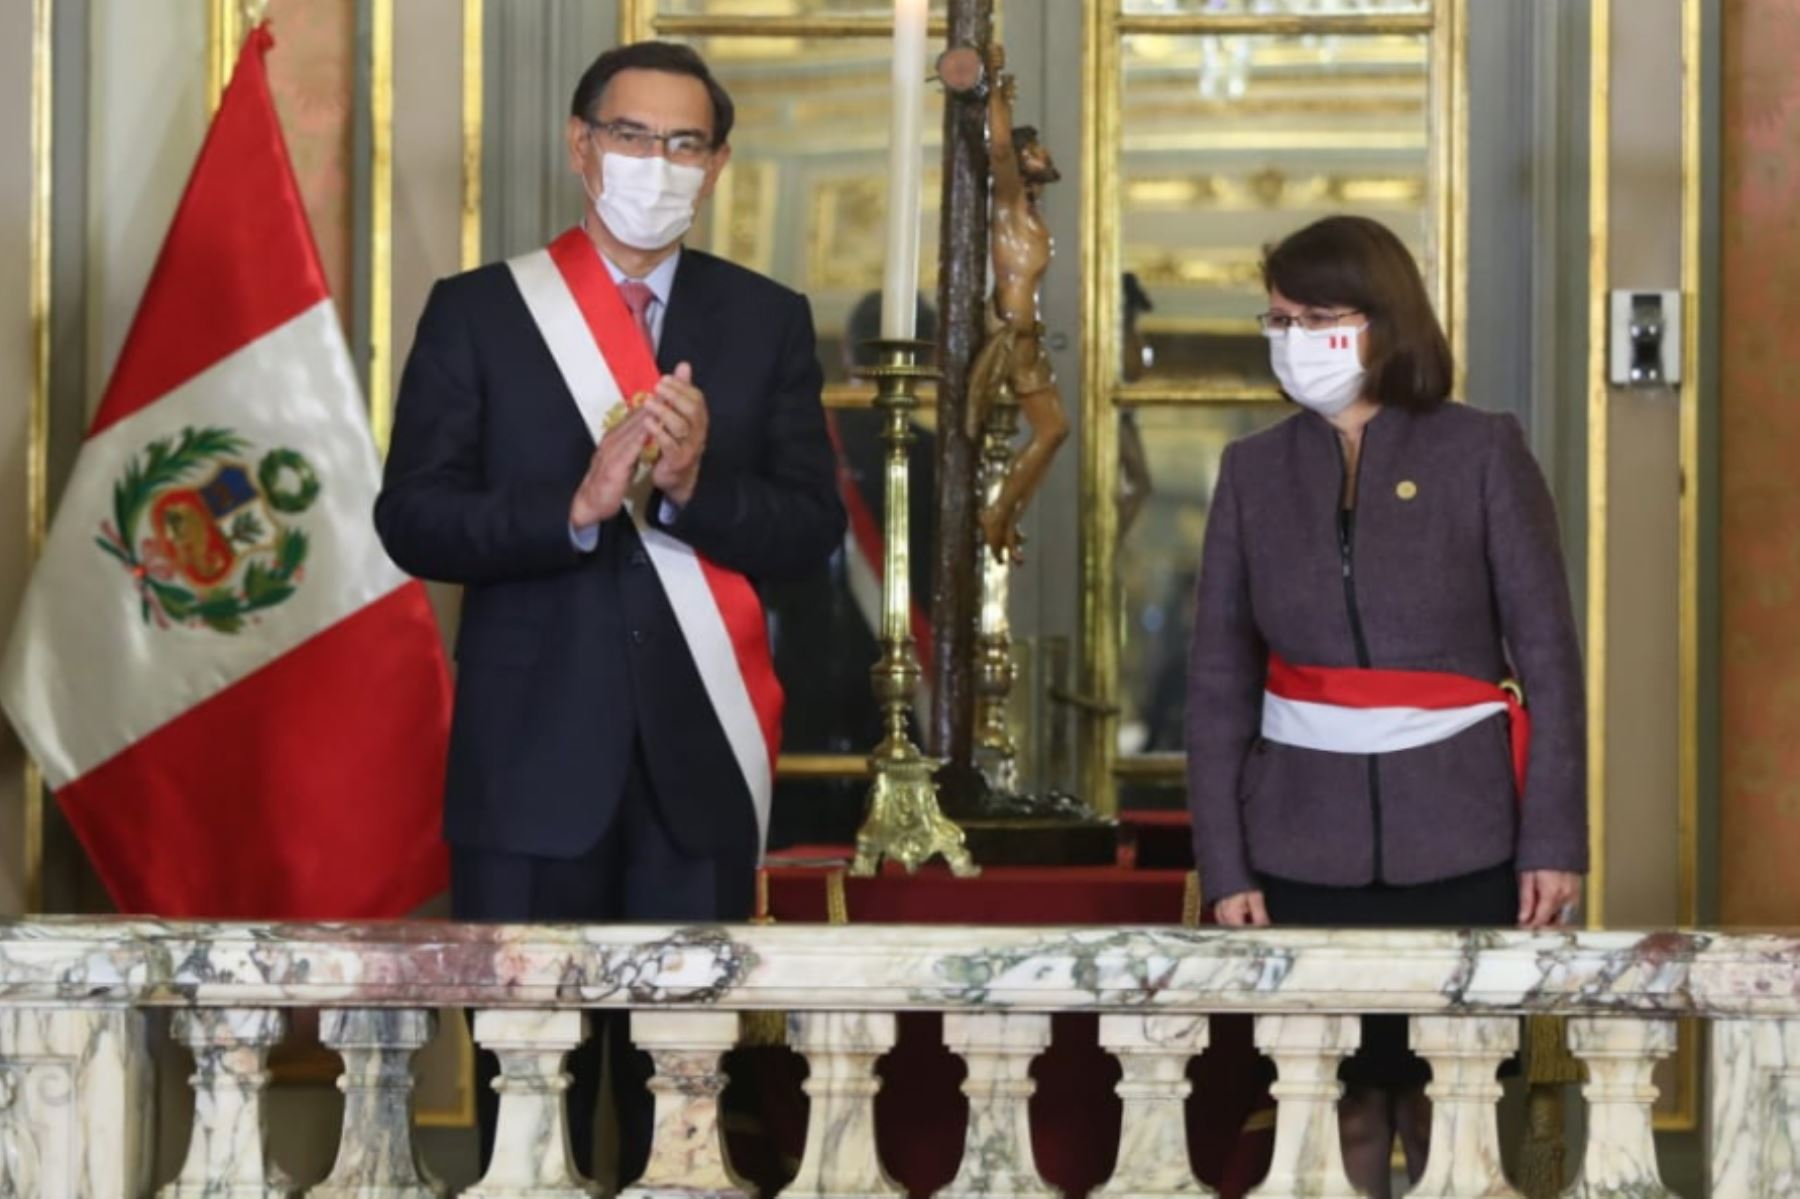 El presidente de la República, Martín Vizcarra, toma juramento a Pilar Mazzetti como ministra de Salud.  Foto: ANDINA/ Prensa Presidencia